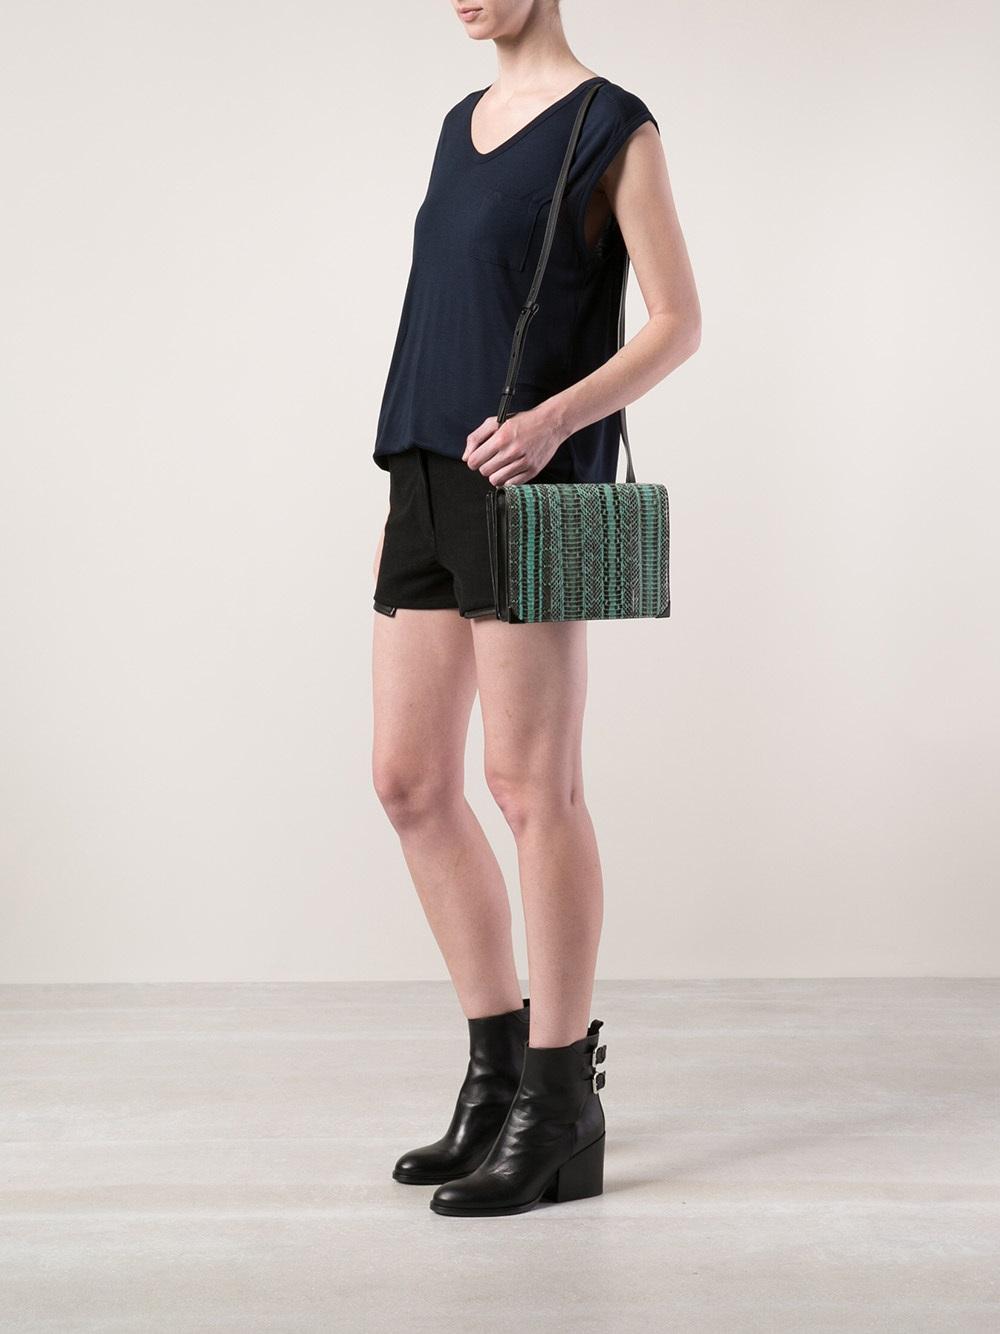 New Styles Prisma crossbody bag - Blue Alexander Wang Cheap Online CiHzQI